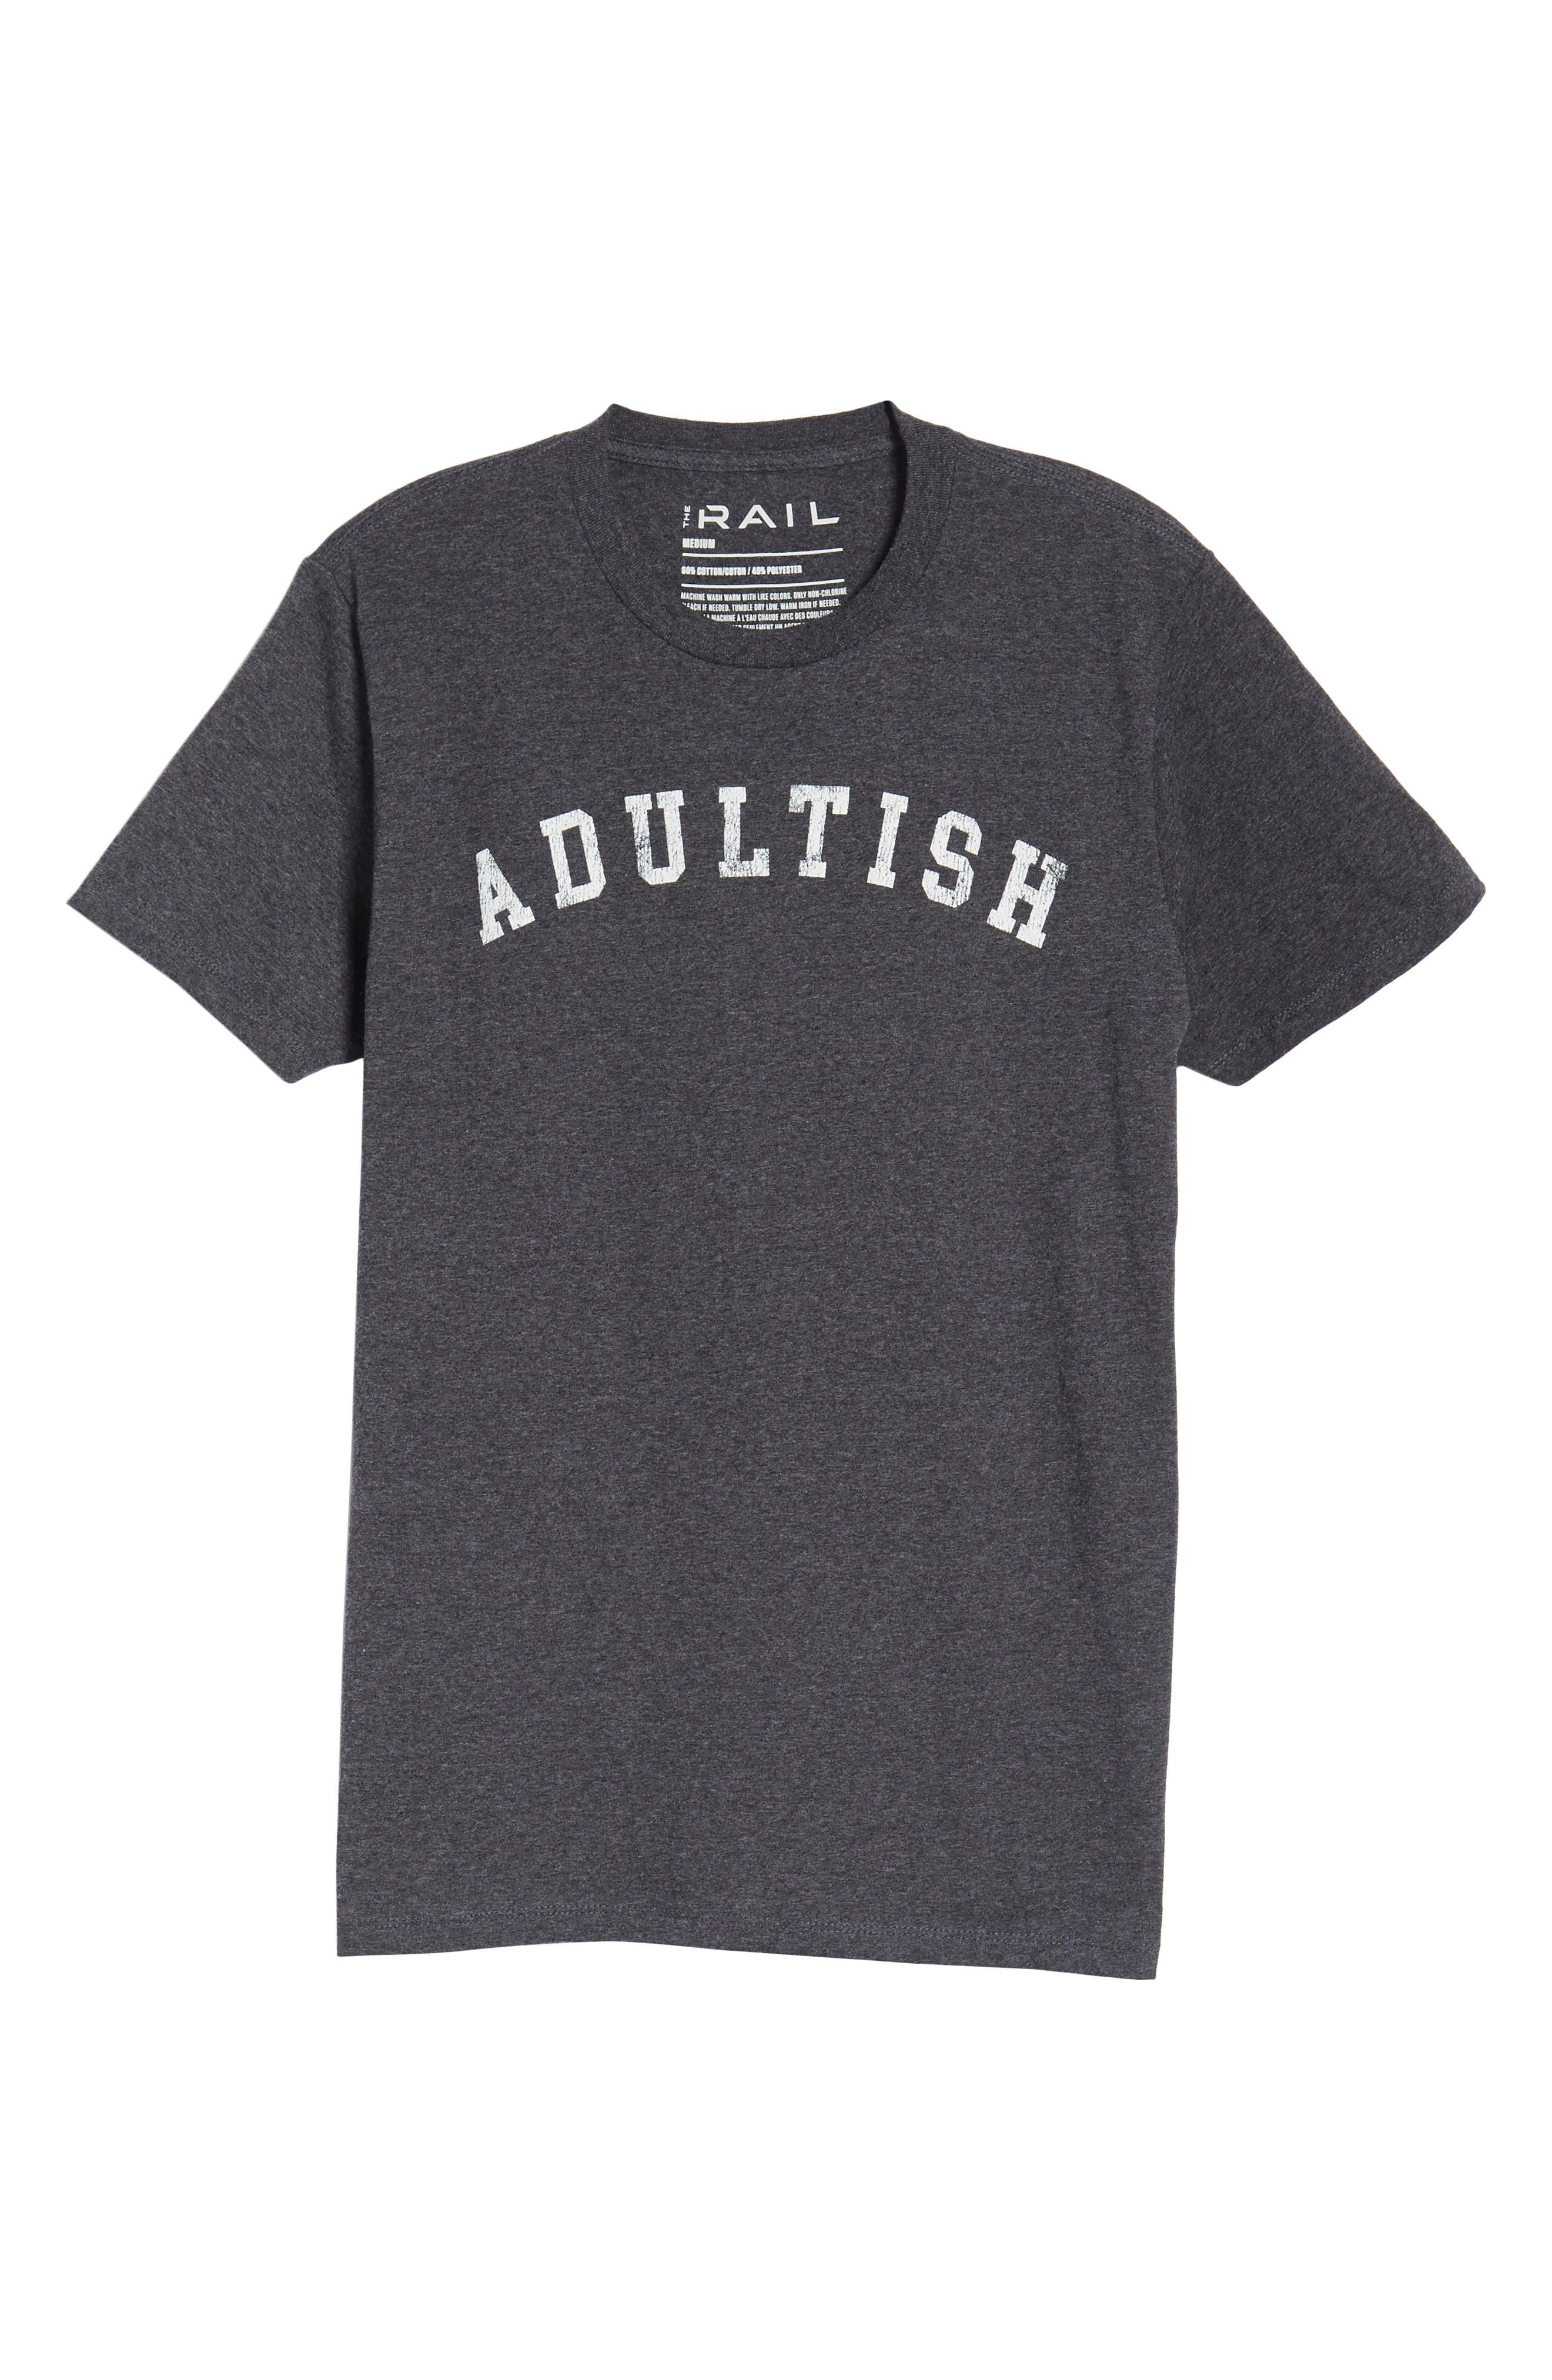 Adultish T-Shirt,                             Alternate thumbnail 6, color,                             001